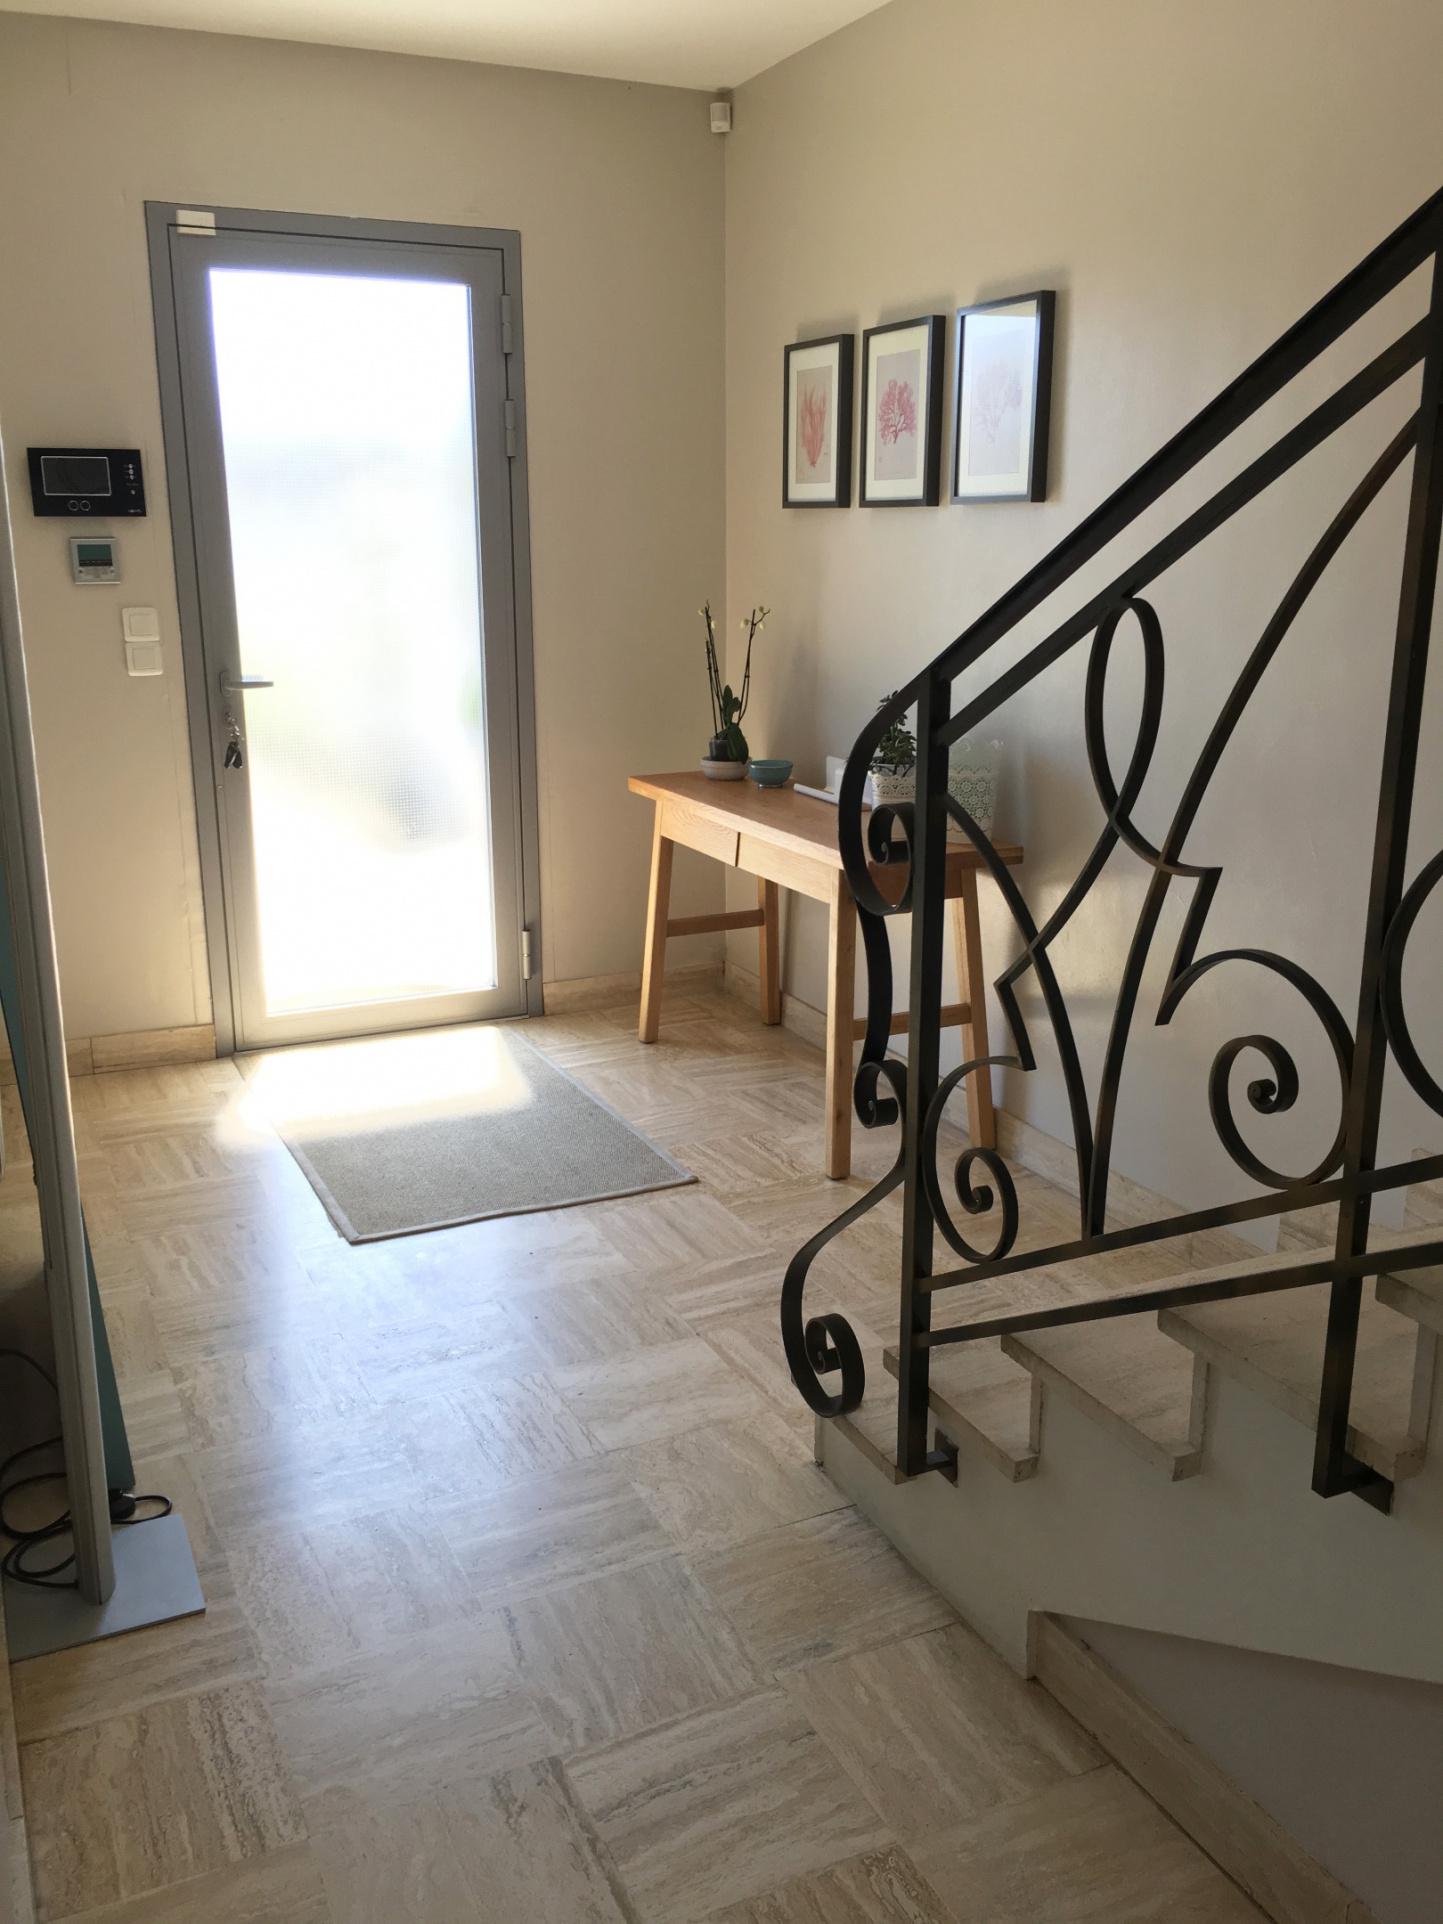 maison/villa lagord LAGORD - QUARTIER RESIDENTIEL ET PROCHE COMMODITES